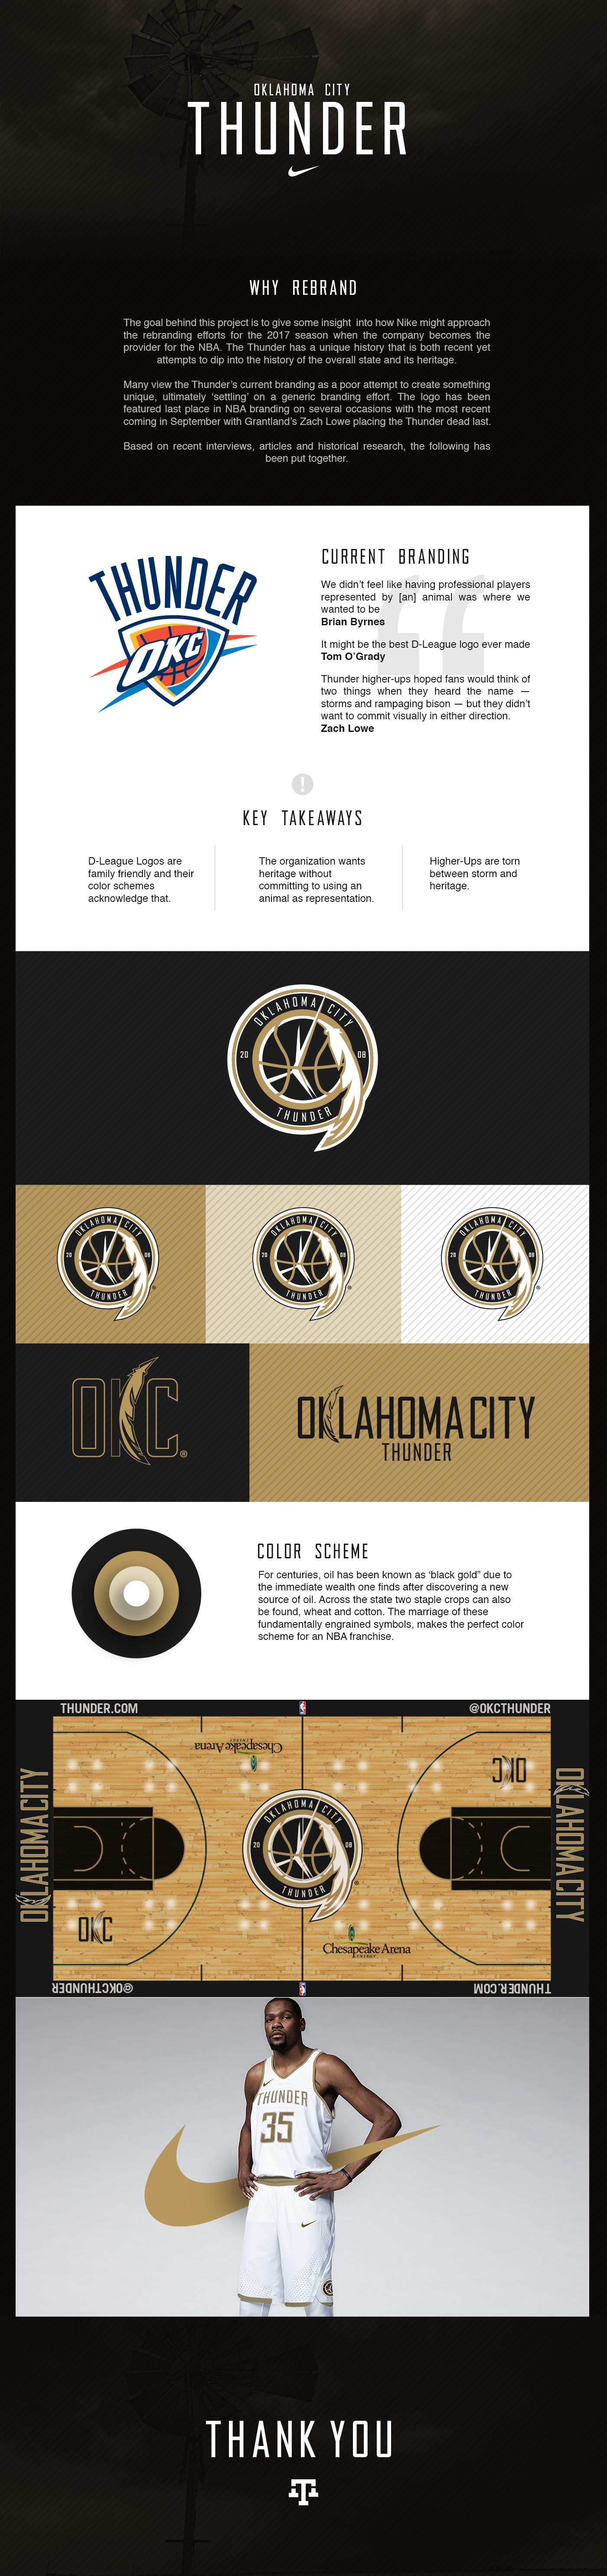 029cafde5 Oklahoma City Thunder  Rebrand (Concept) on Behance